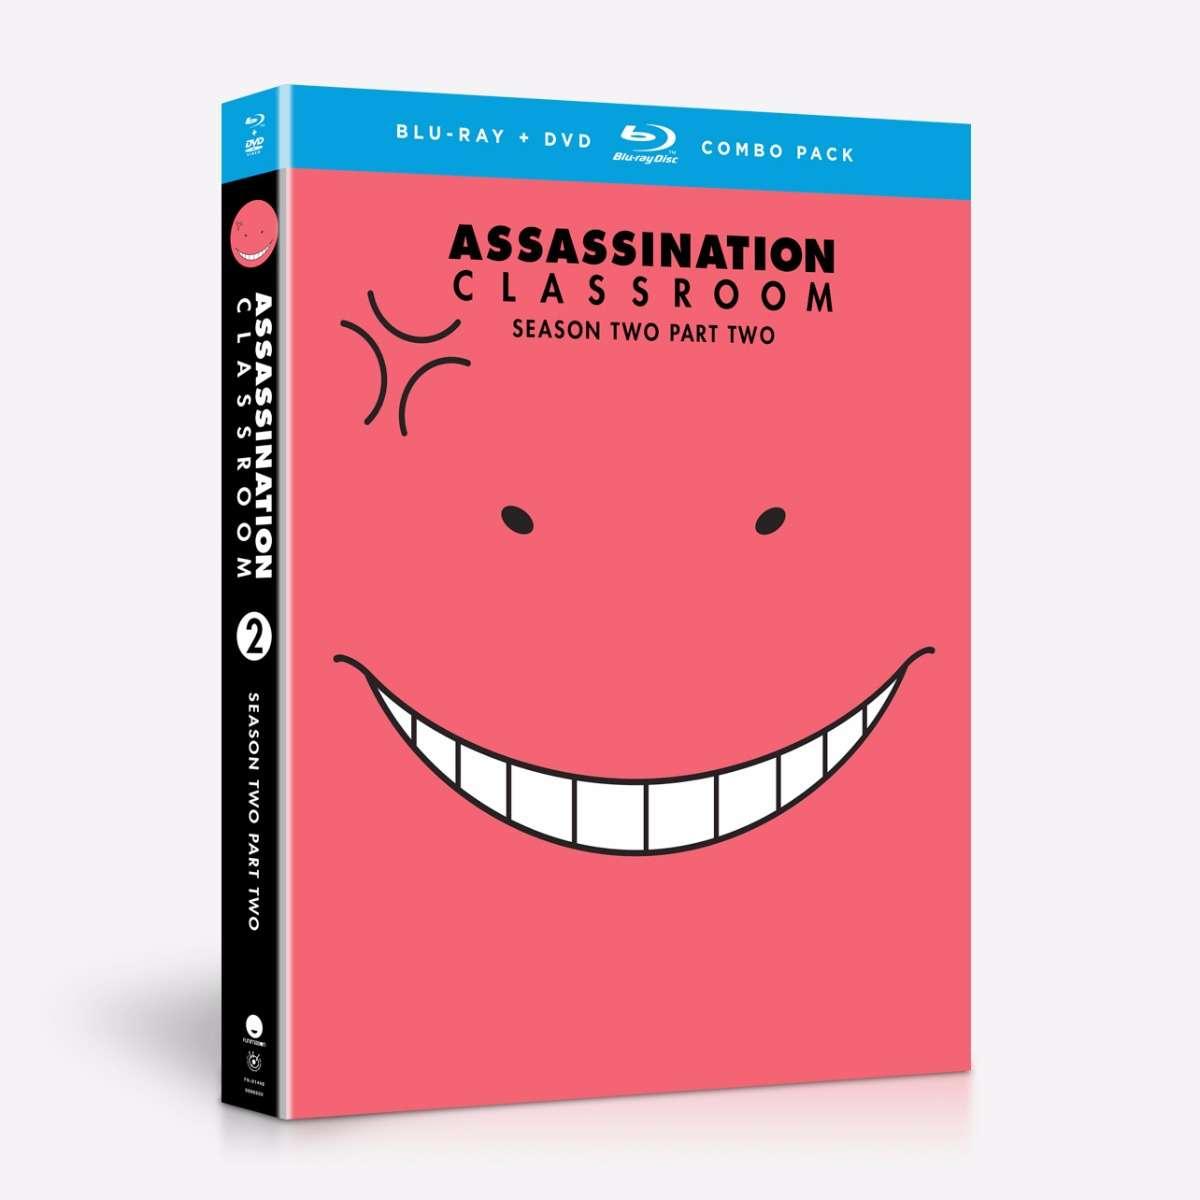 Season Two Part Two - BD/DVD Combo home-video